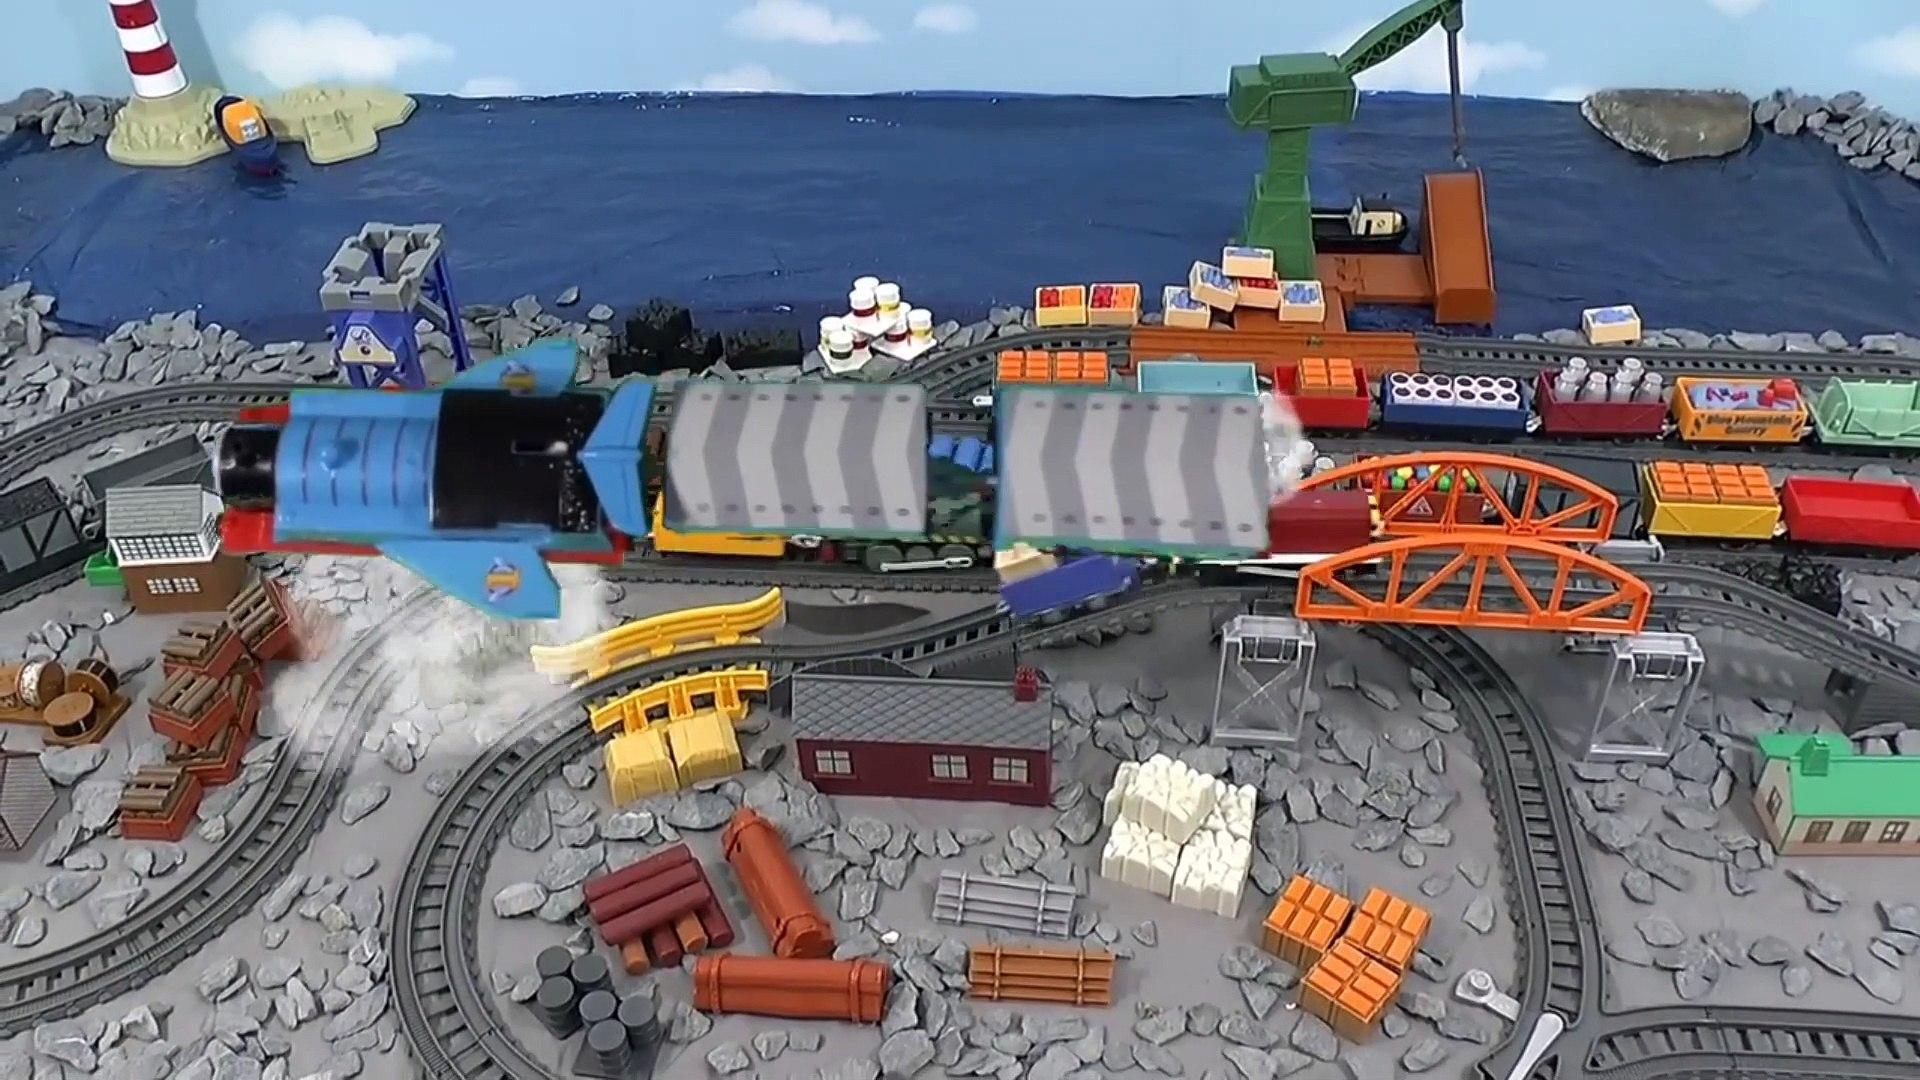 Thomas & Friends  Winged Thomas Accident Episode Story - Family Fun Toy Train Story using Thomas